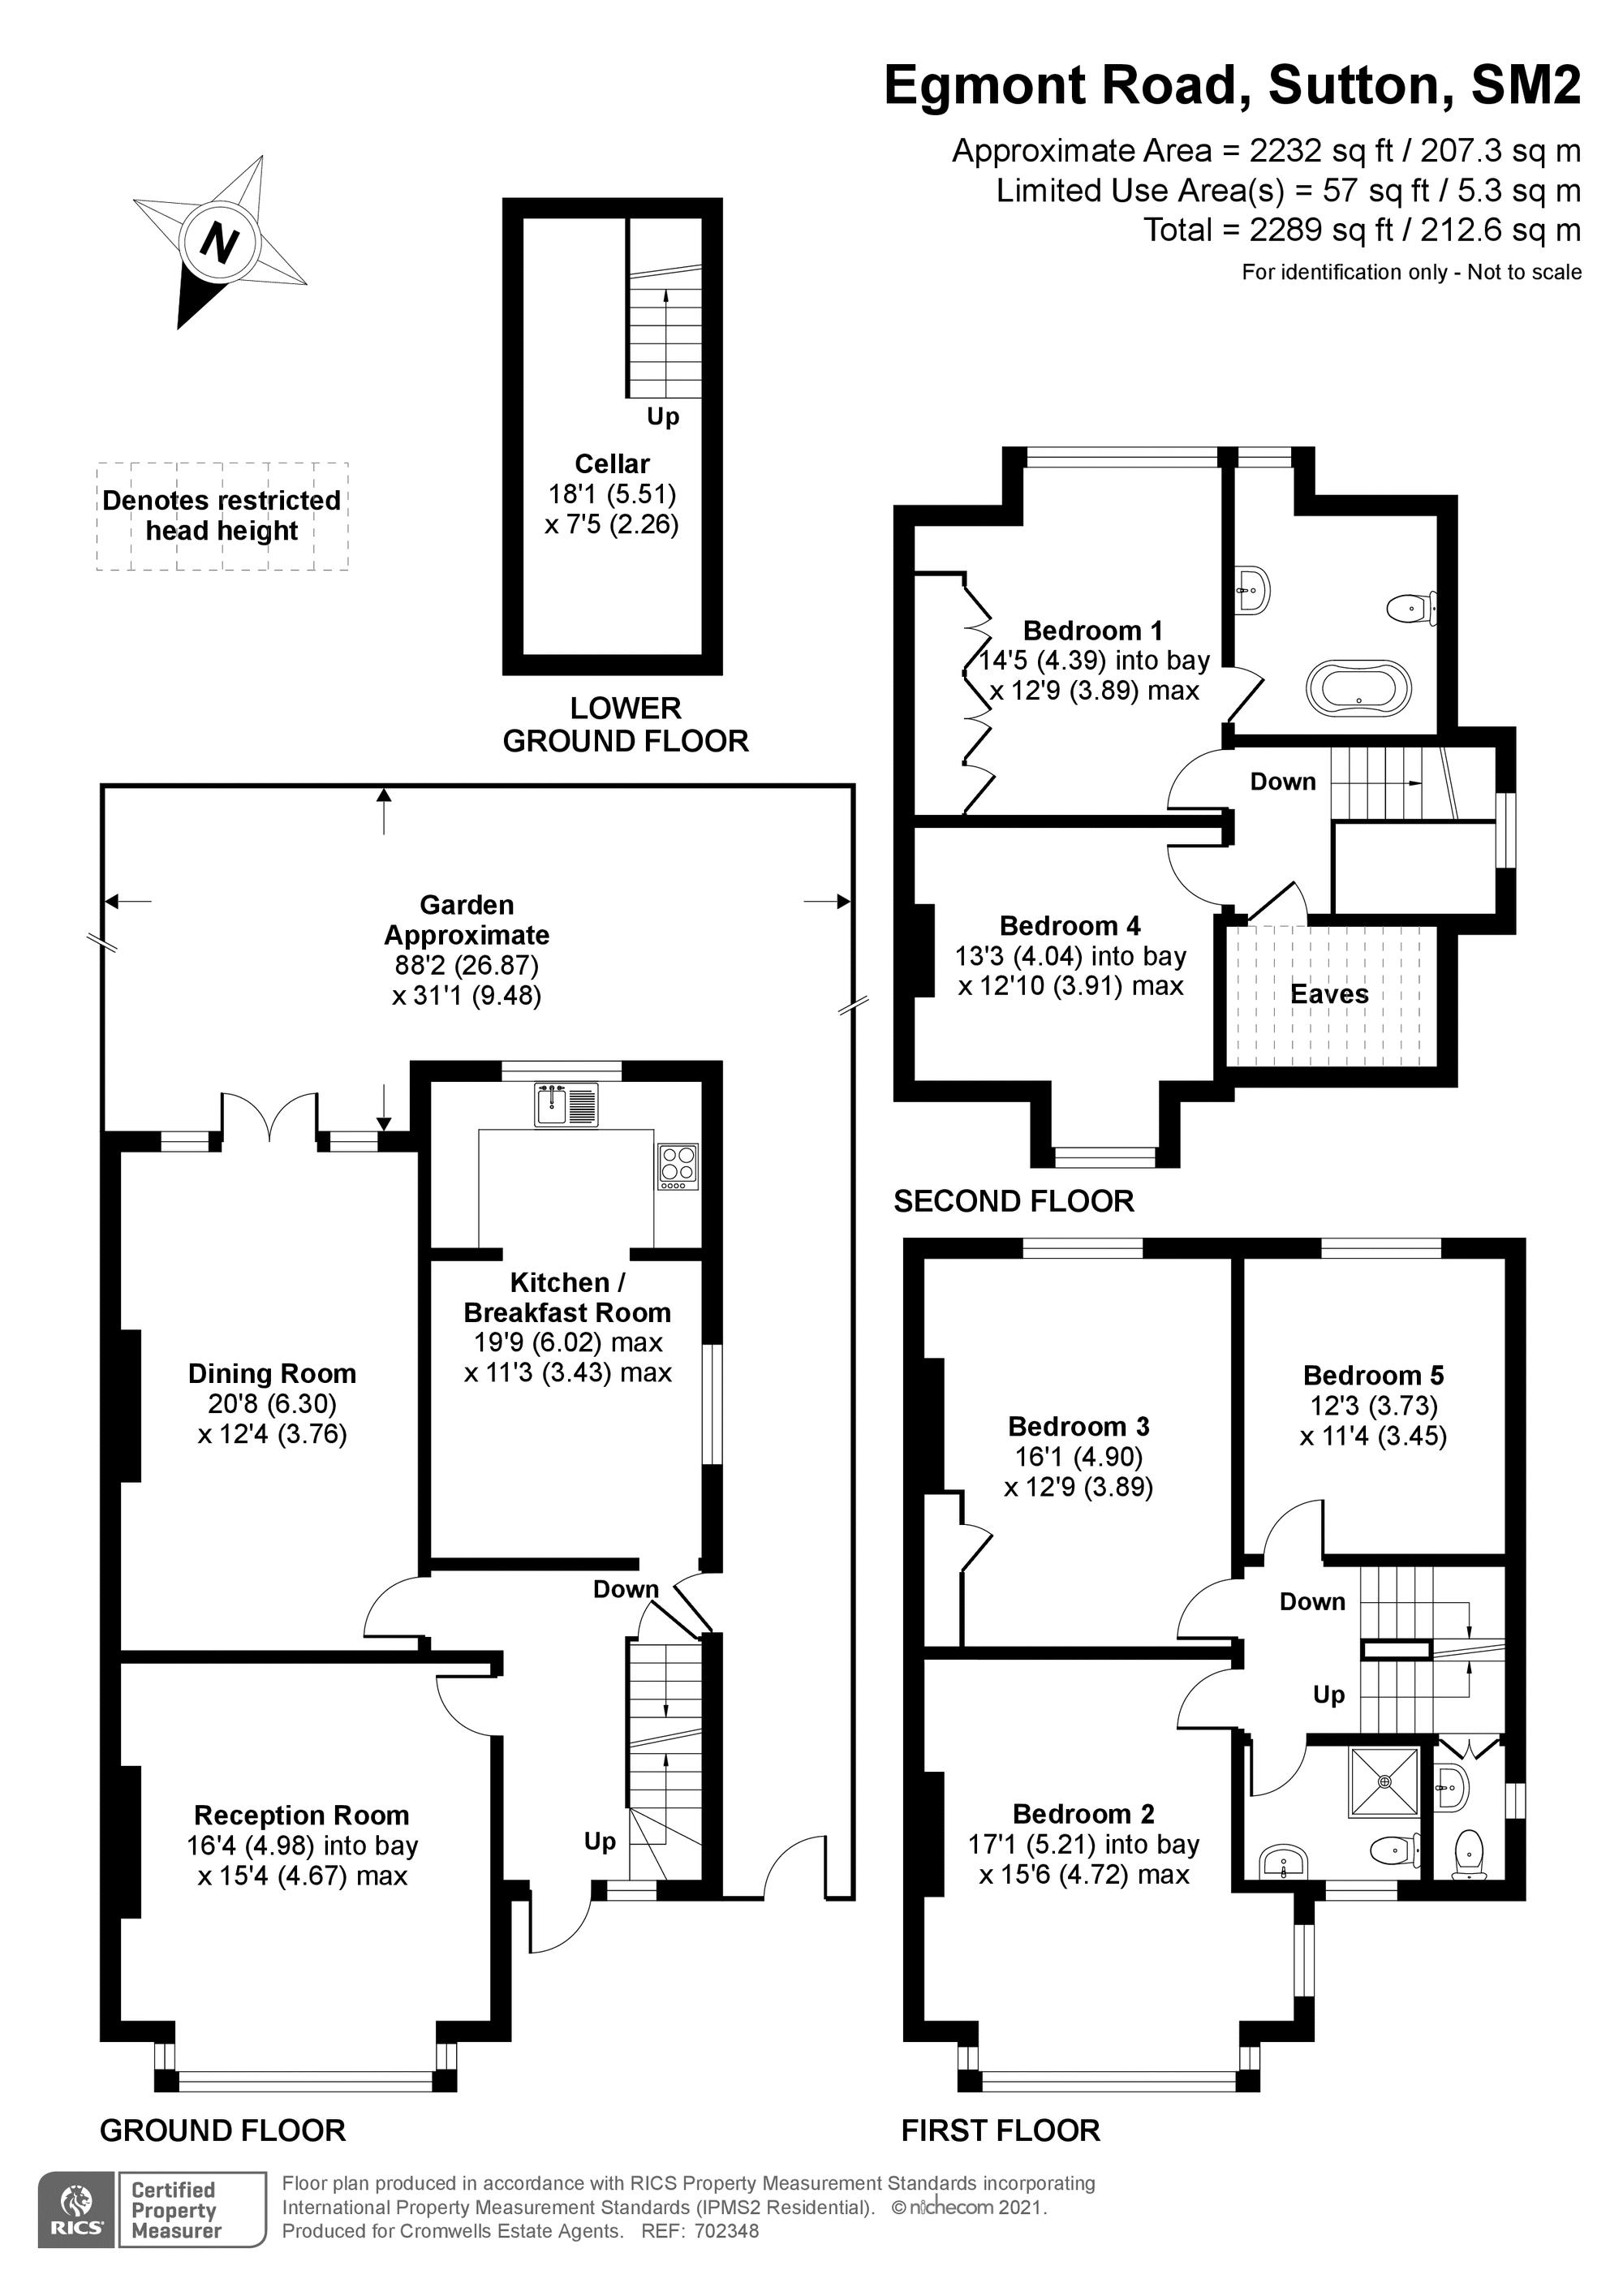 5 bedroom semi detached house SSTC in South Sutton - floorplan 1.